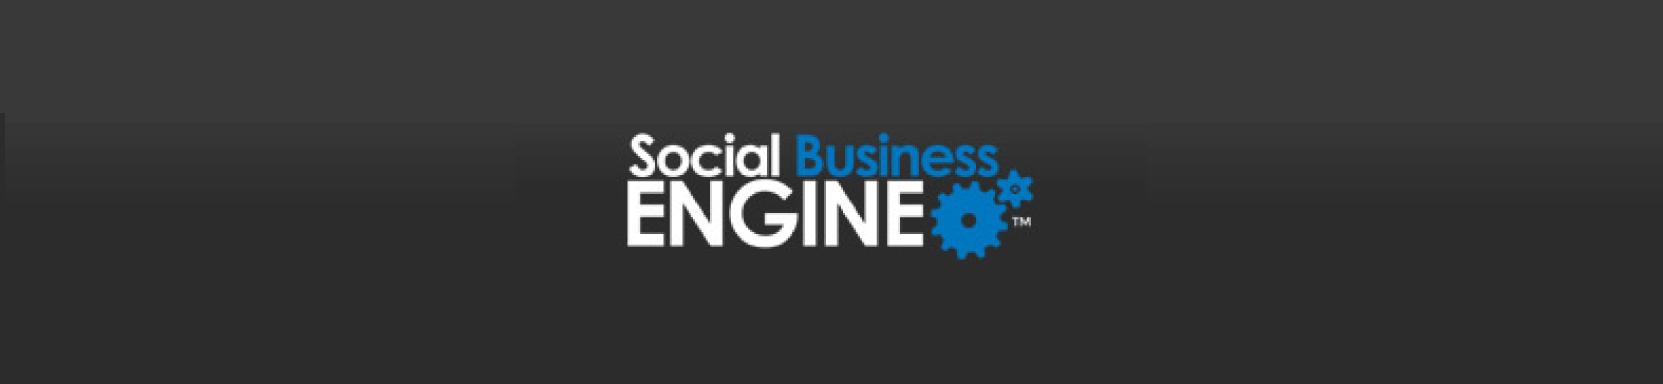 Social Business Engine Social media Marketing Podcast